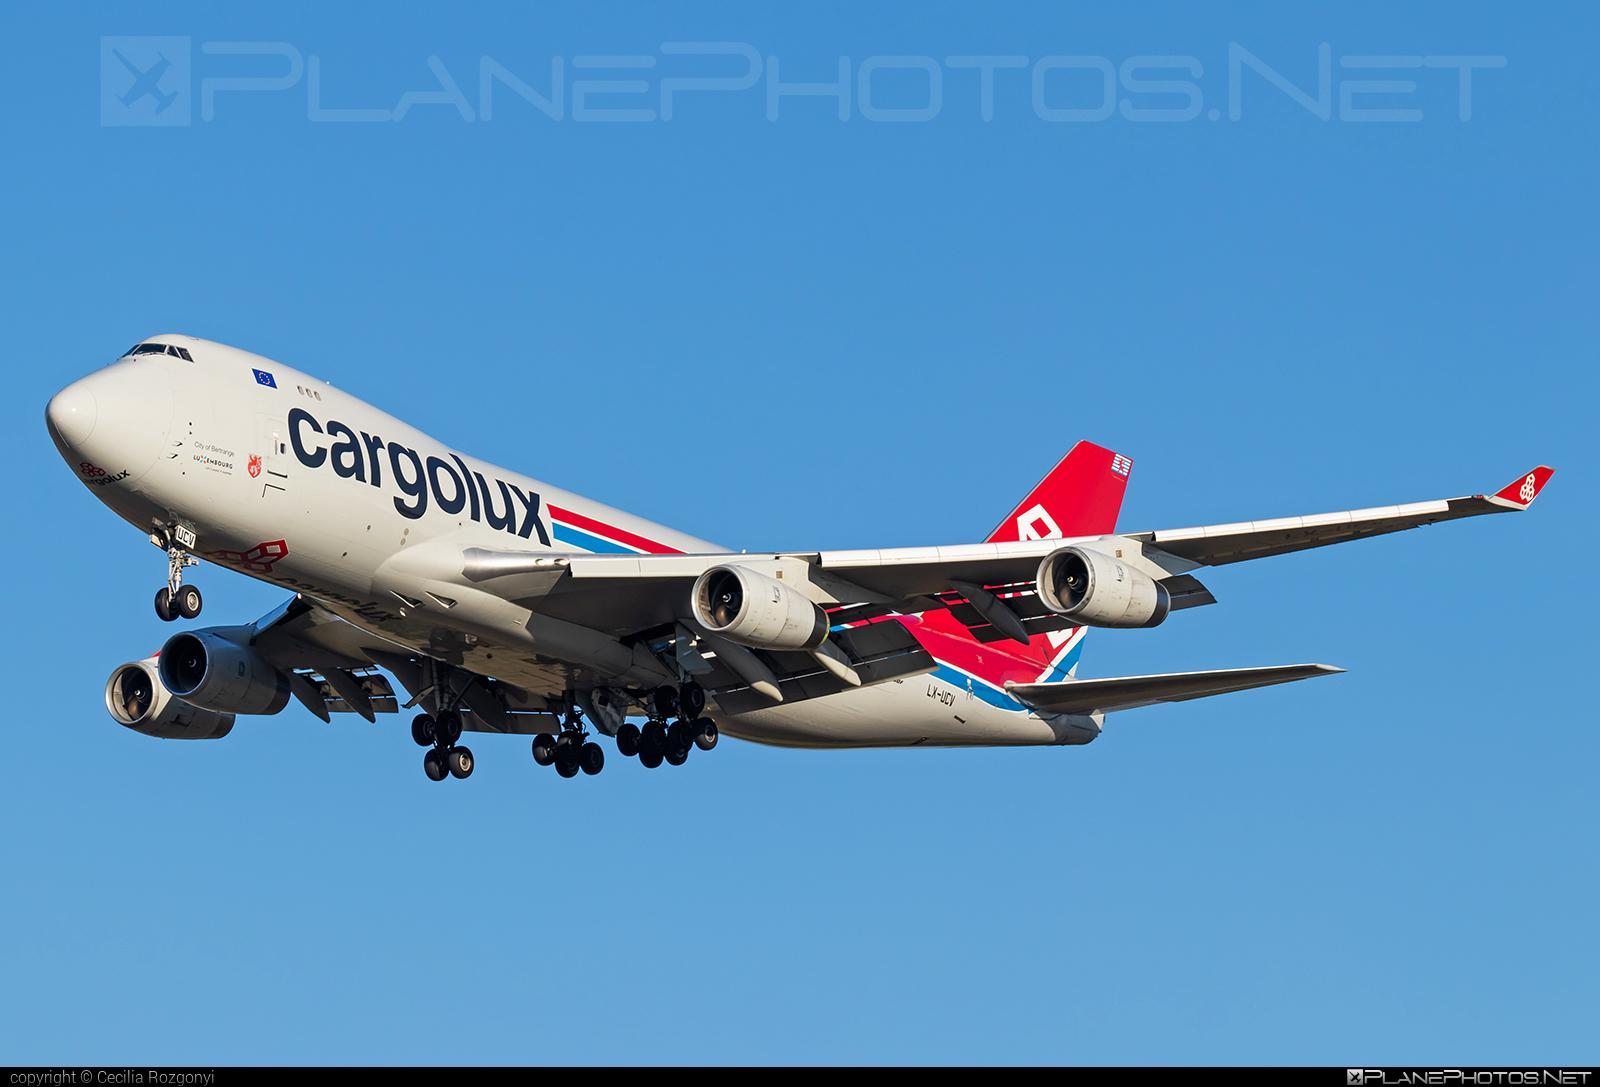 Boeing 747-400F - LX-UCV operated by Cargolux Airlines International #b747 #boeing #boeing747 #cargolux #jumbo